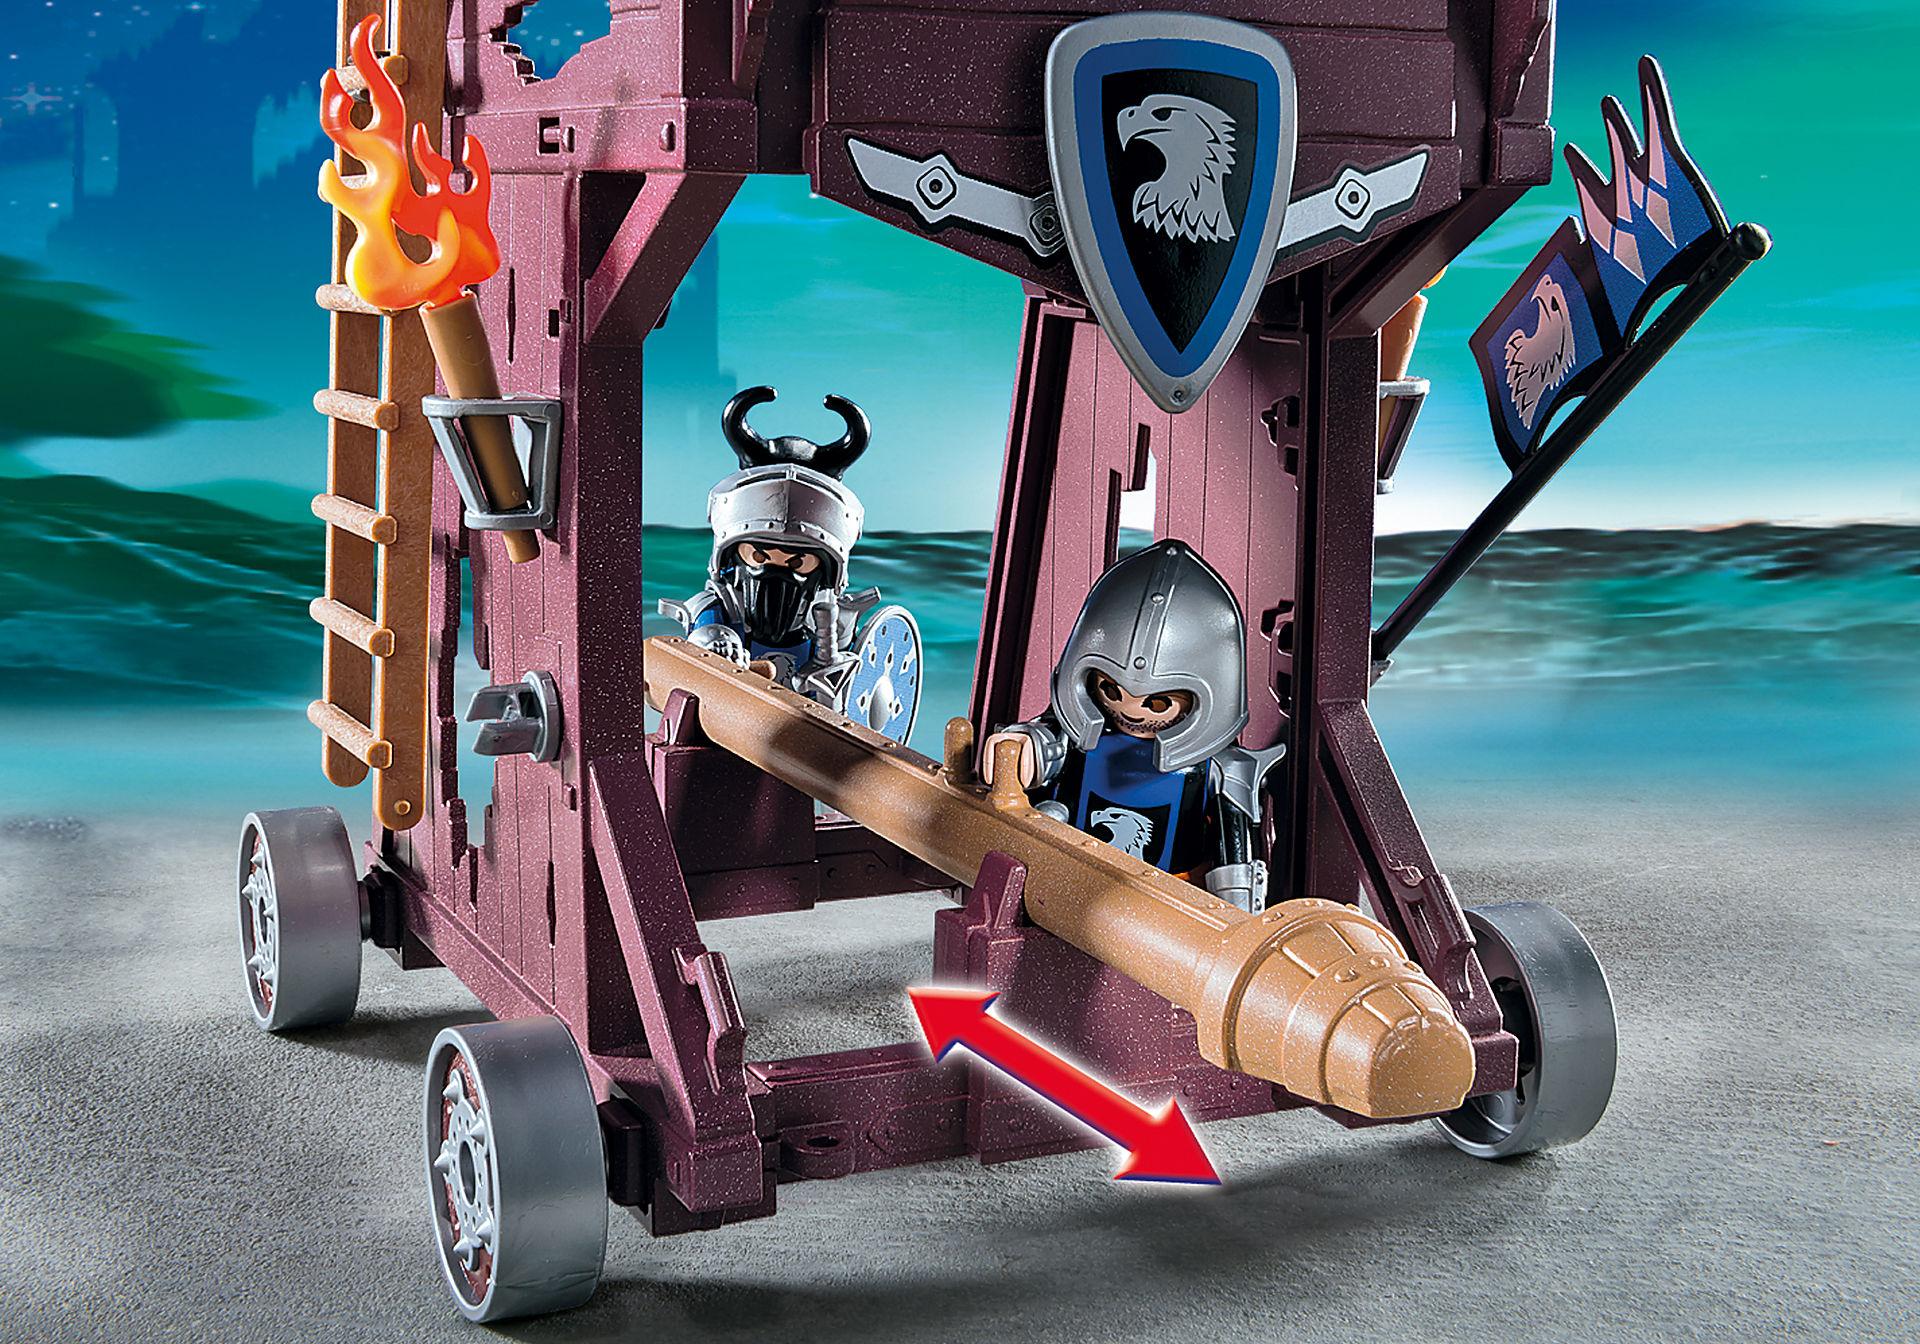 http://media.playmobil.com/i/playmobil/6628_product_extra1/Aanvalstoren van de Valkenridders